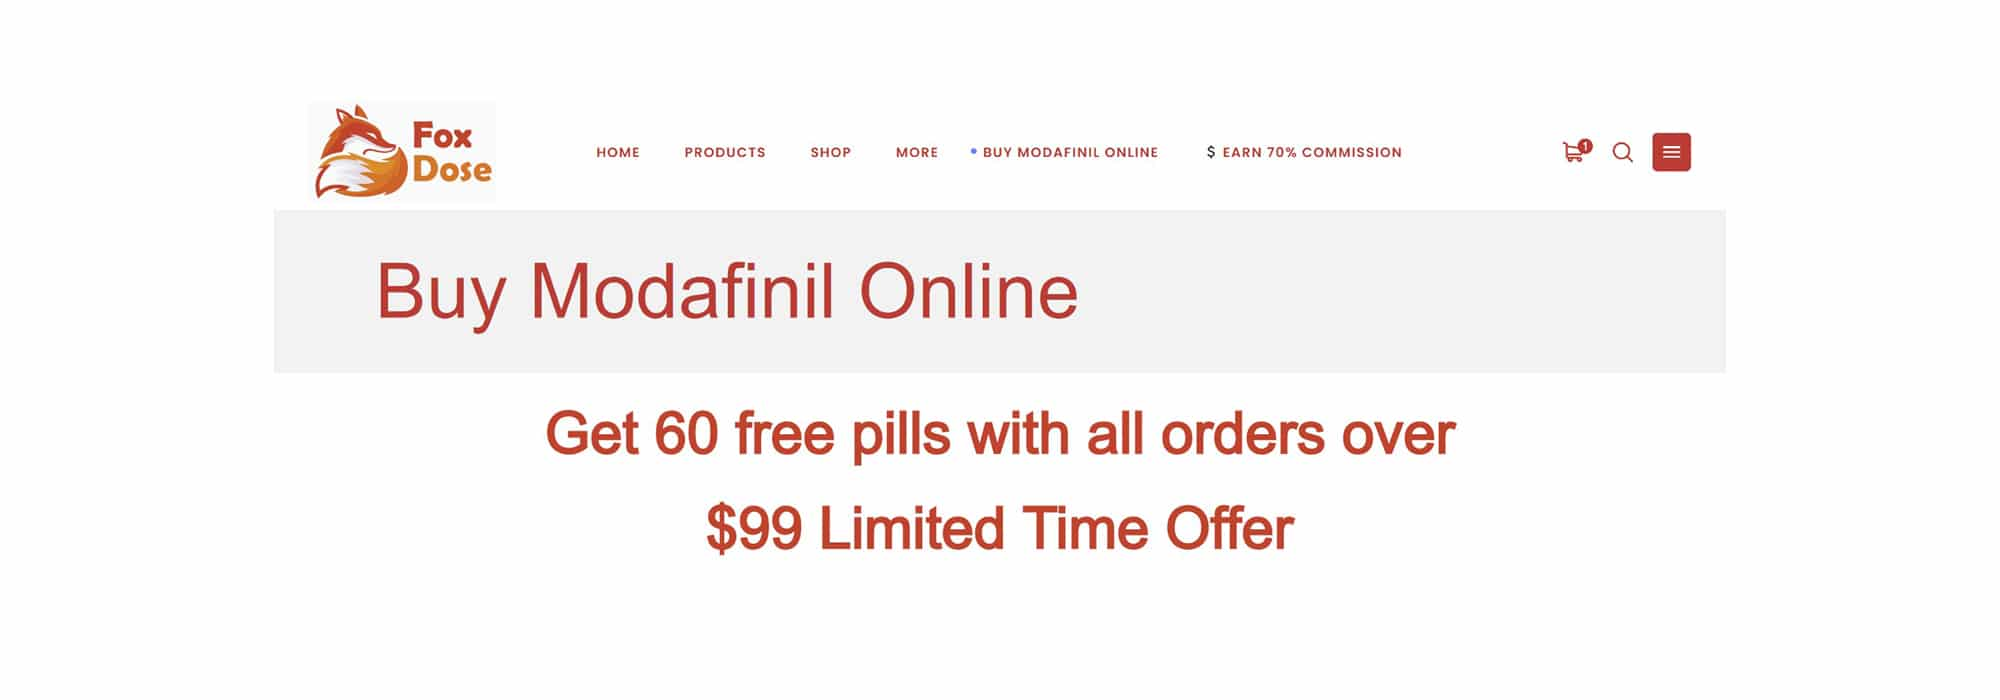 Foxdose 60 free pills